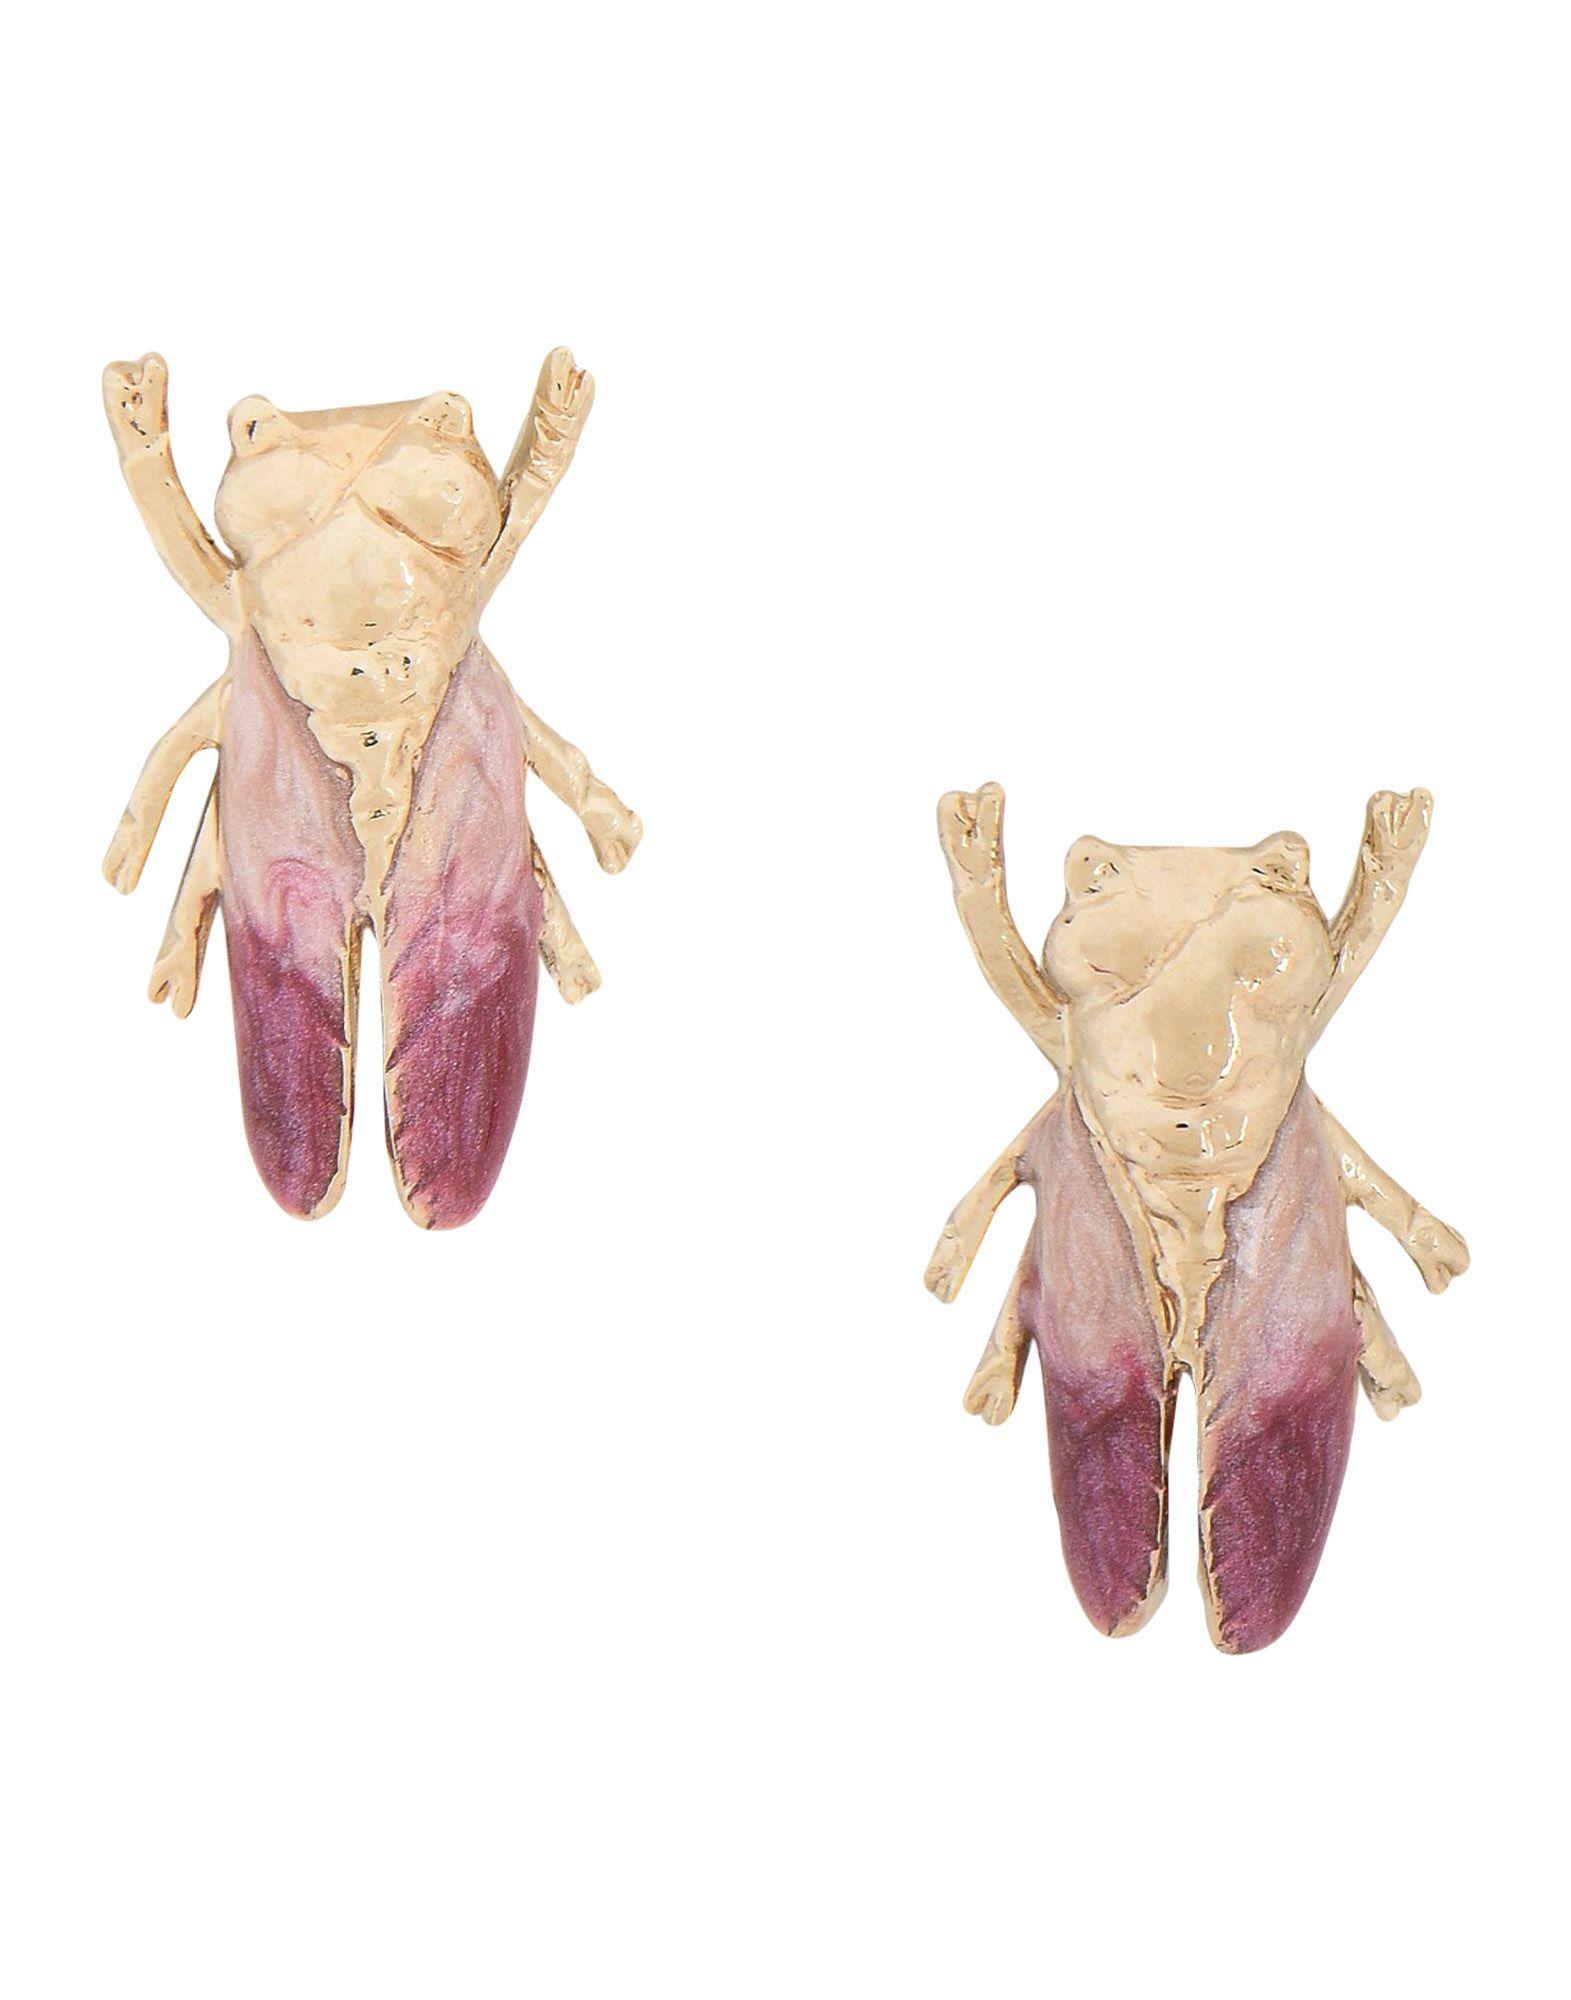 ILENIA CORTI VERNISSAGE Earrings in Gold